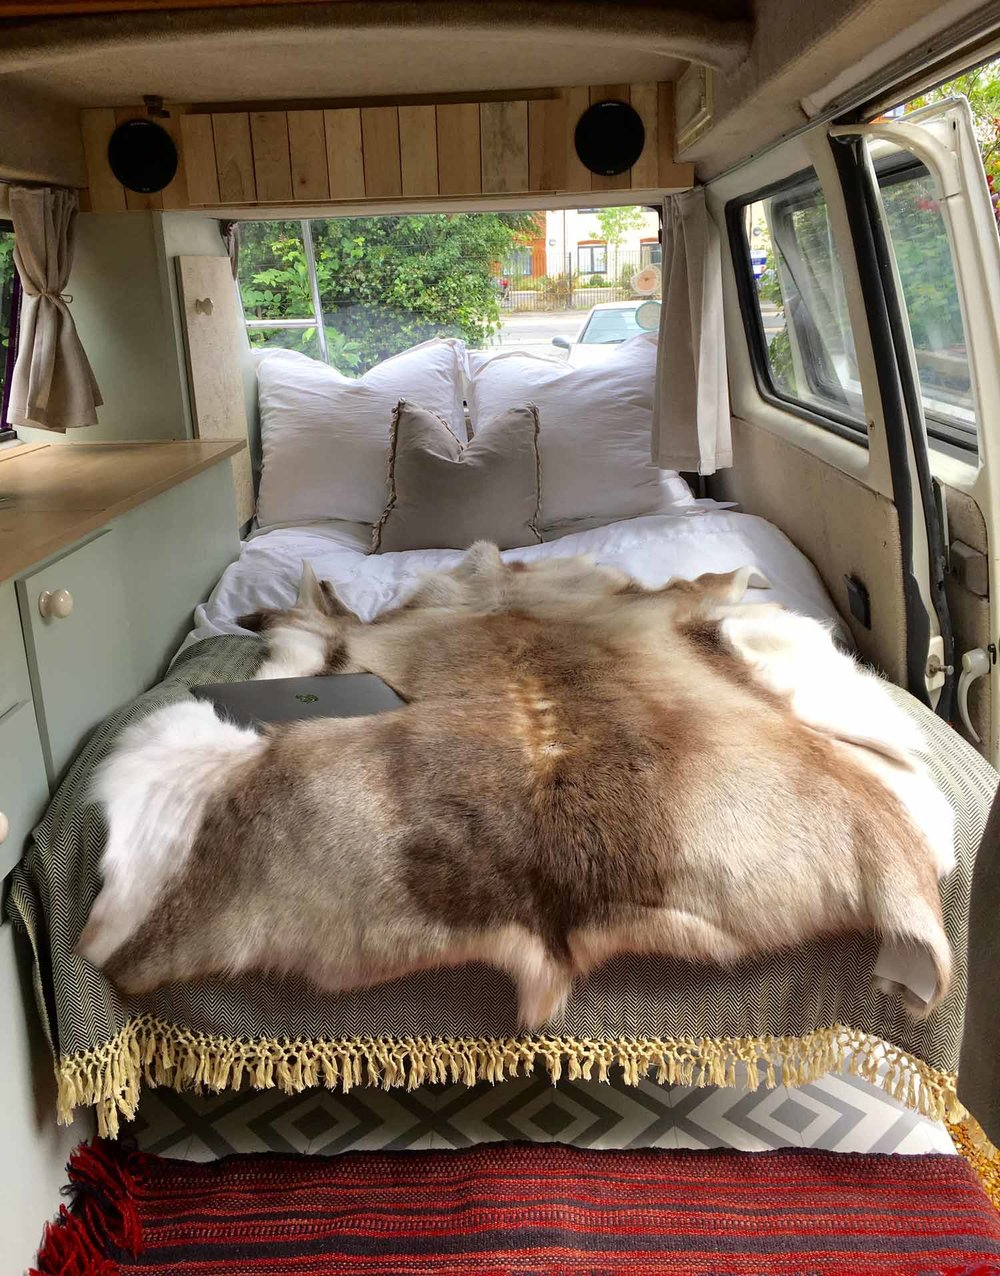 Natasha-Birley-Interior-design-Tatty-Bird-campervan-conversion-1.jpg